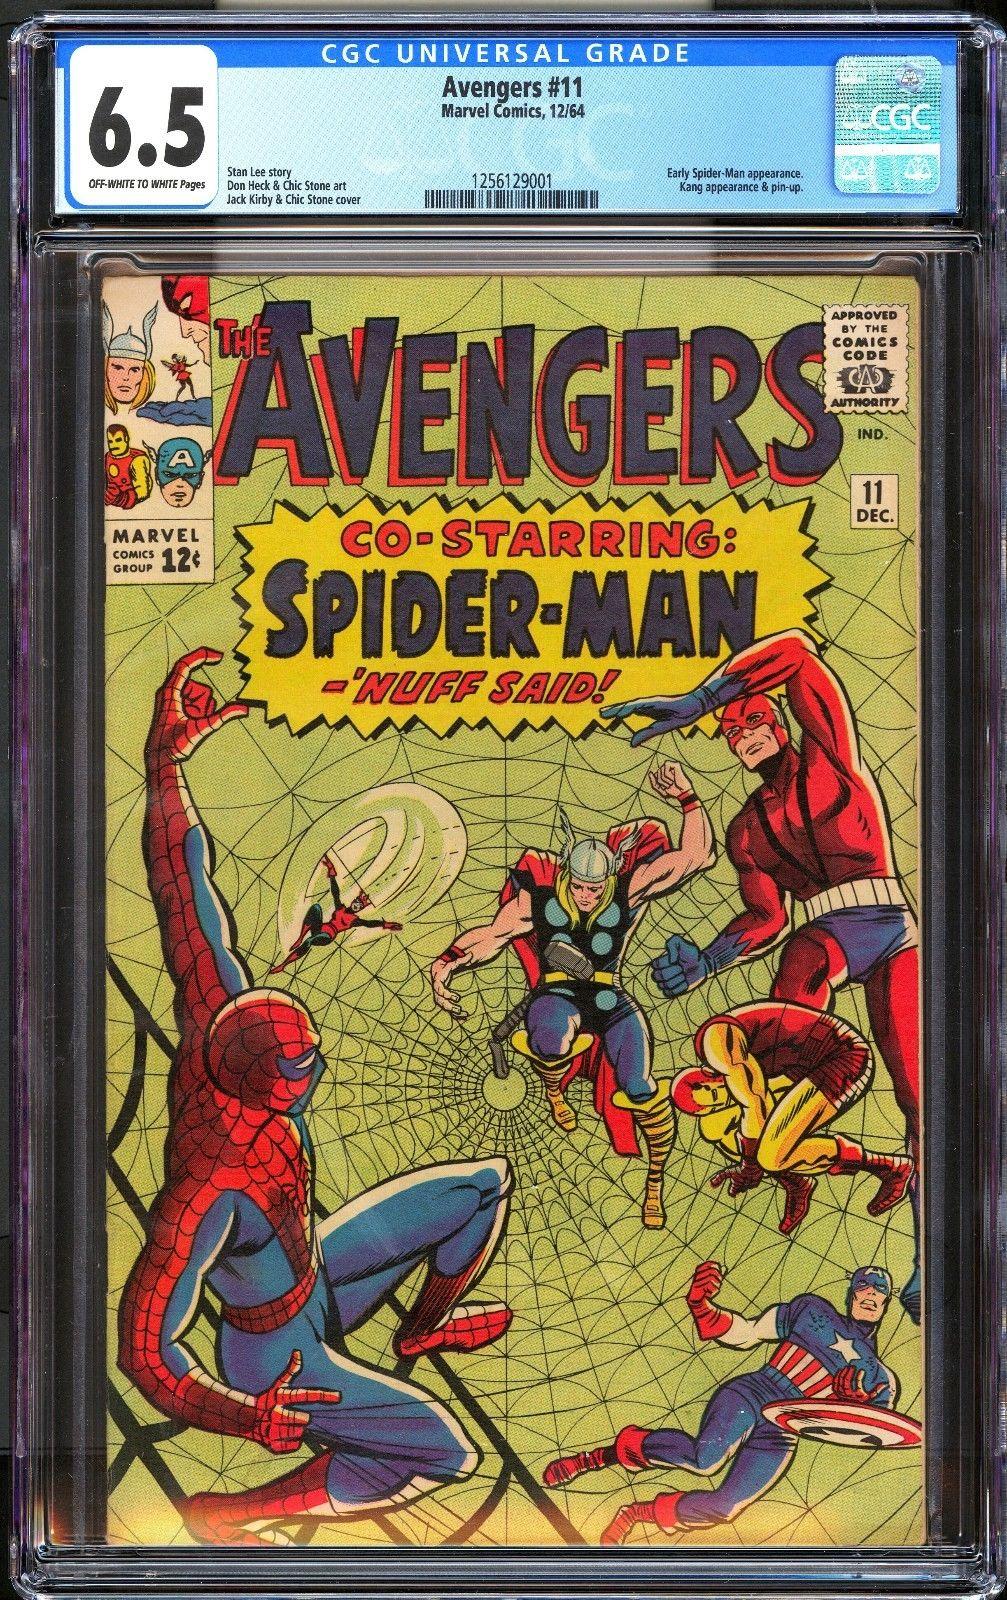 Avengers 11 / CGC 6.5 Universal Blue / Spider-Man /Hi Res Scans